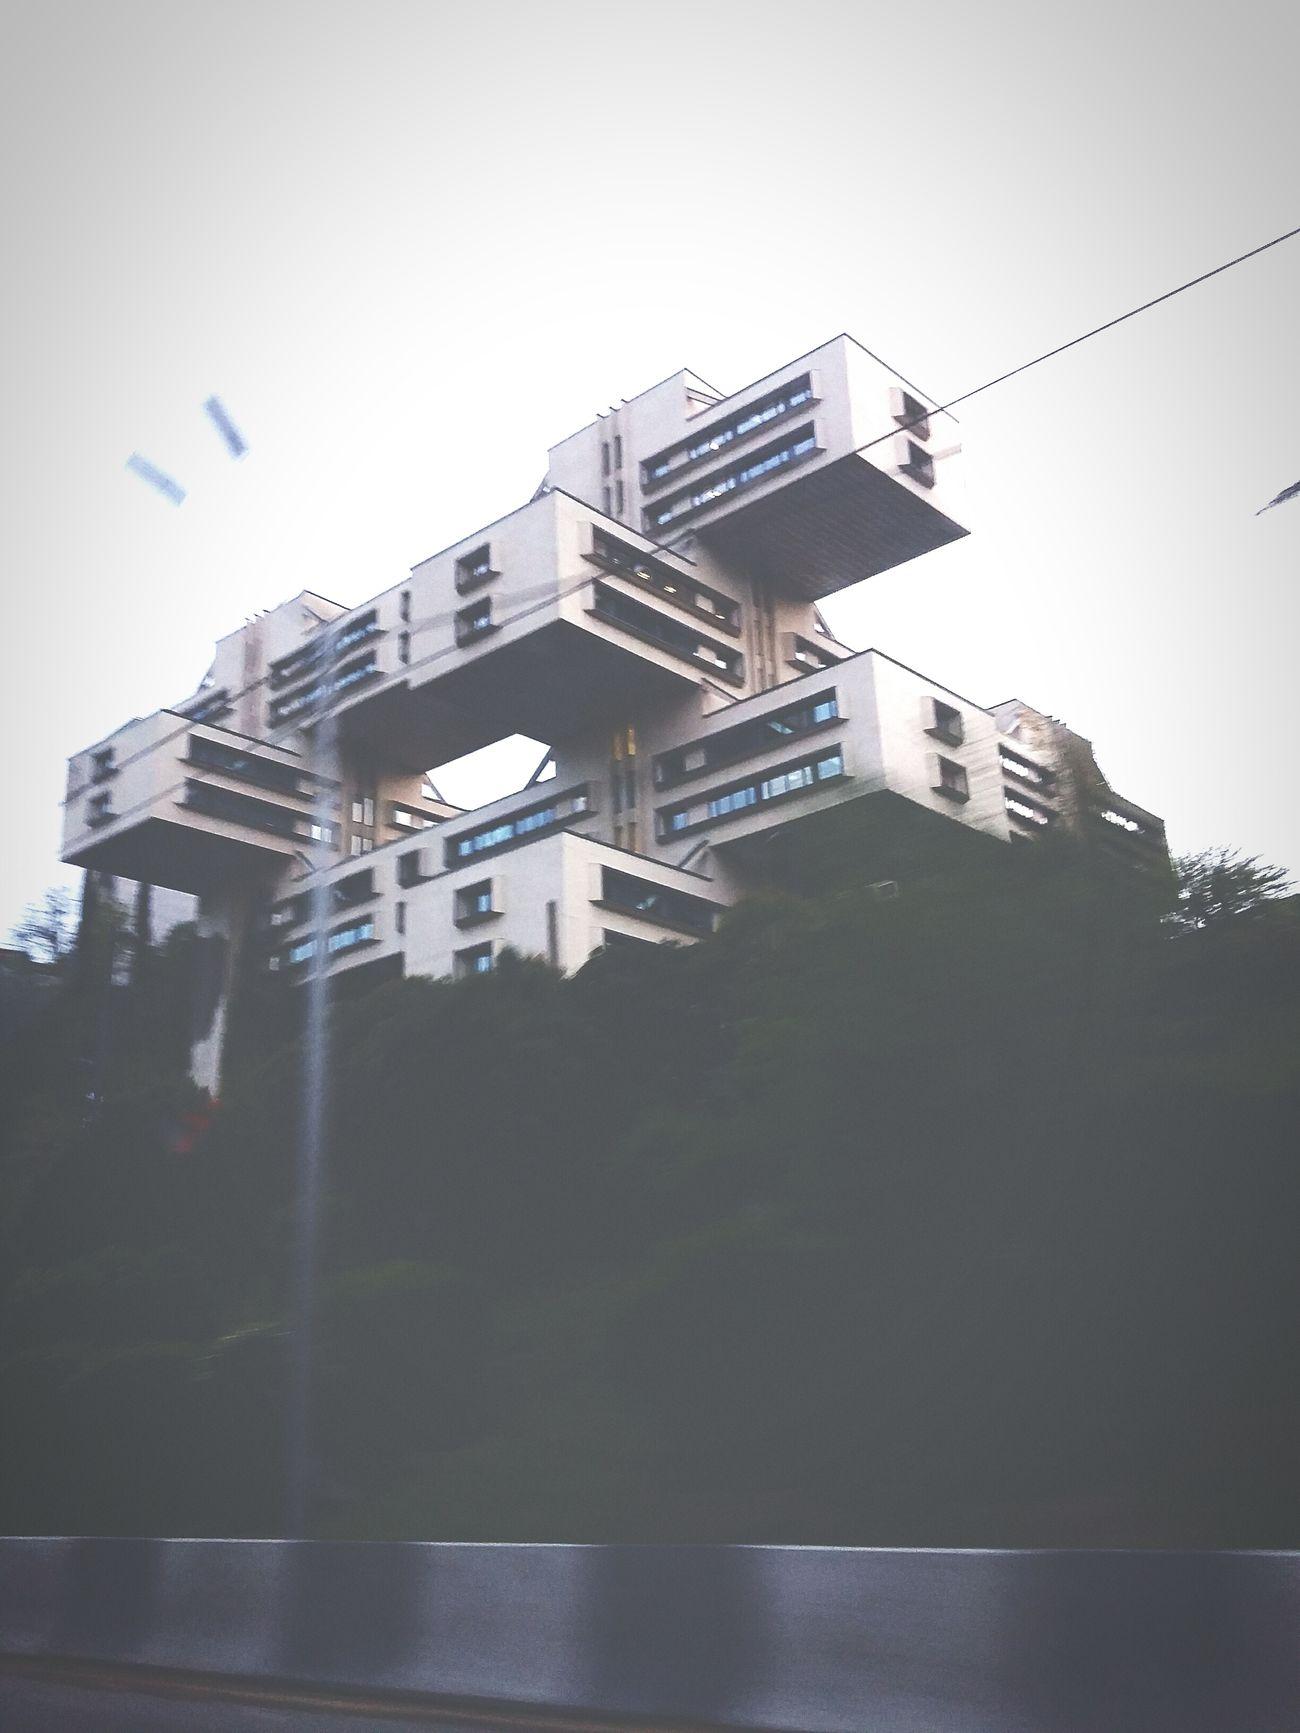 Somewhere in Tbilisi. Soviet style architectur